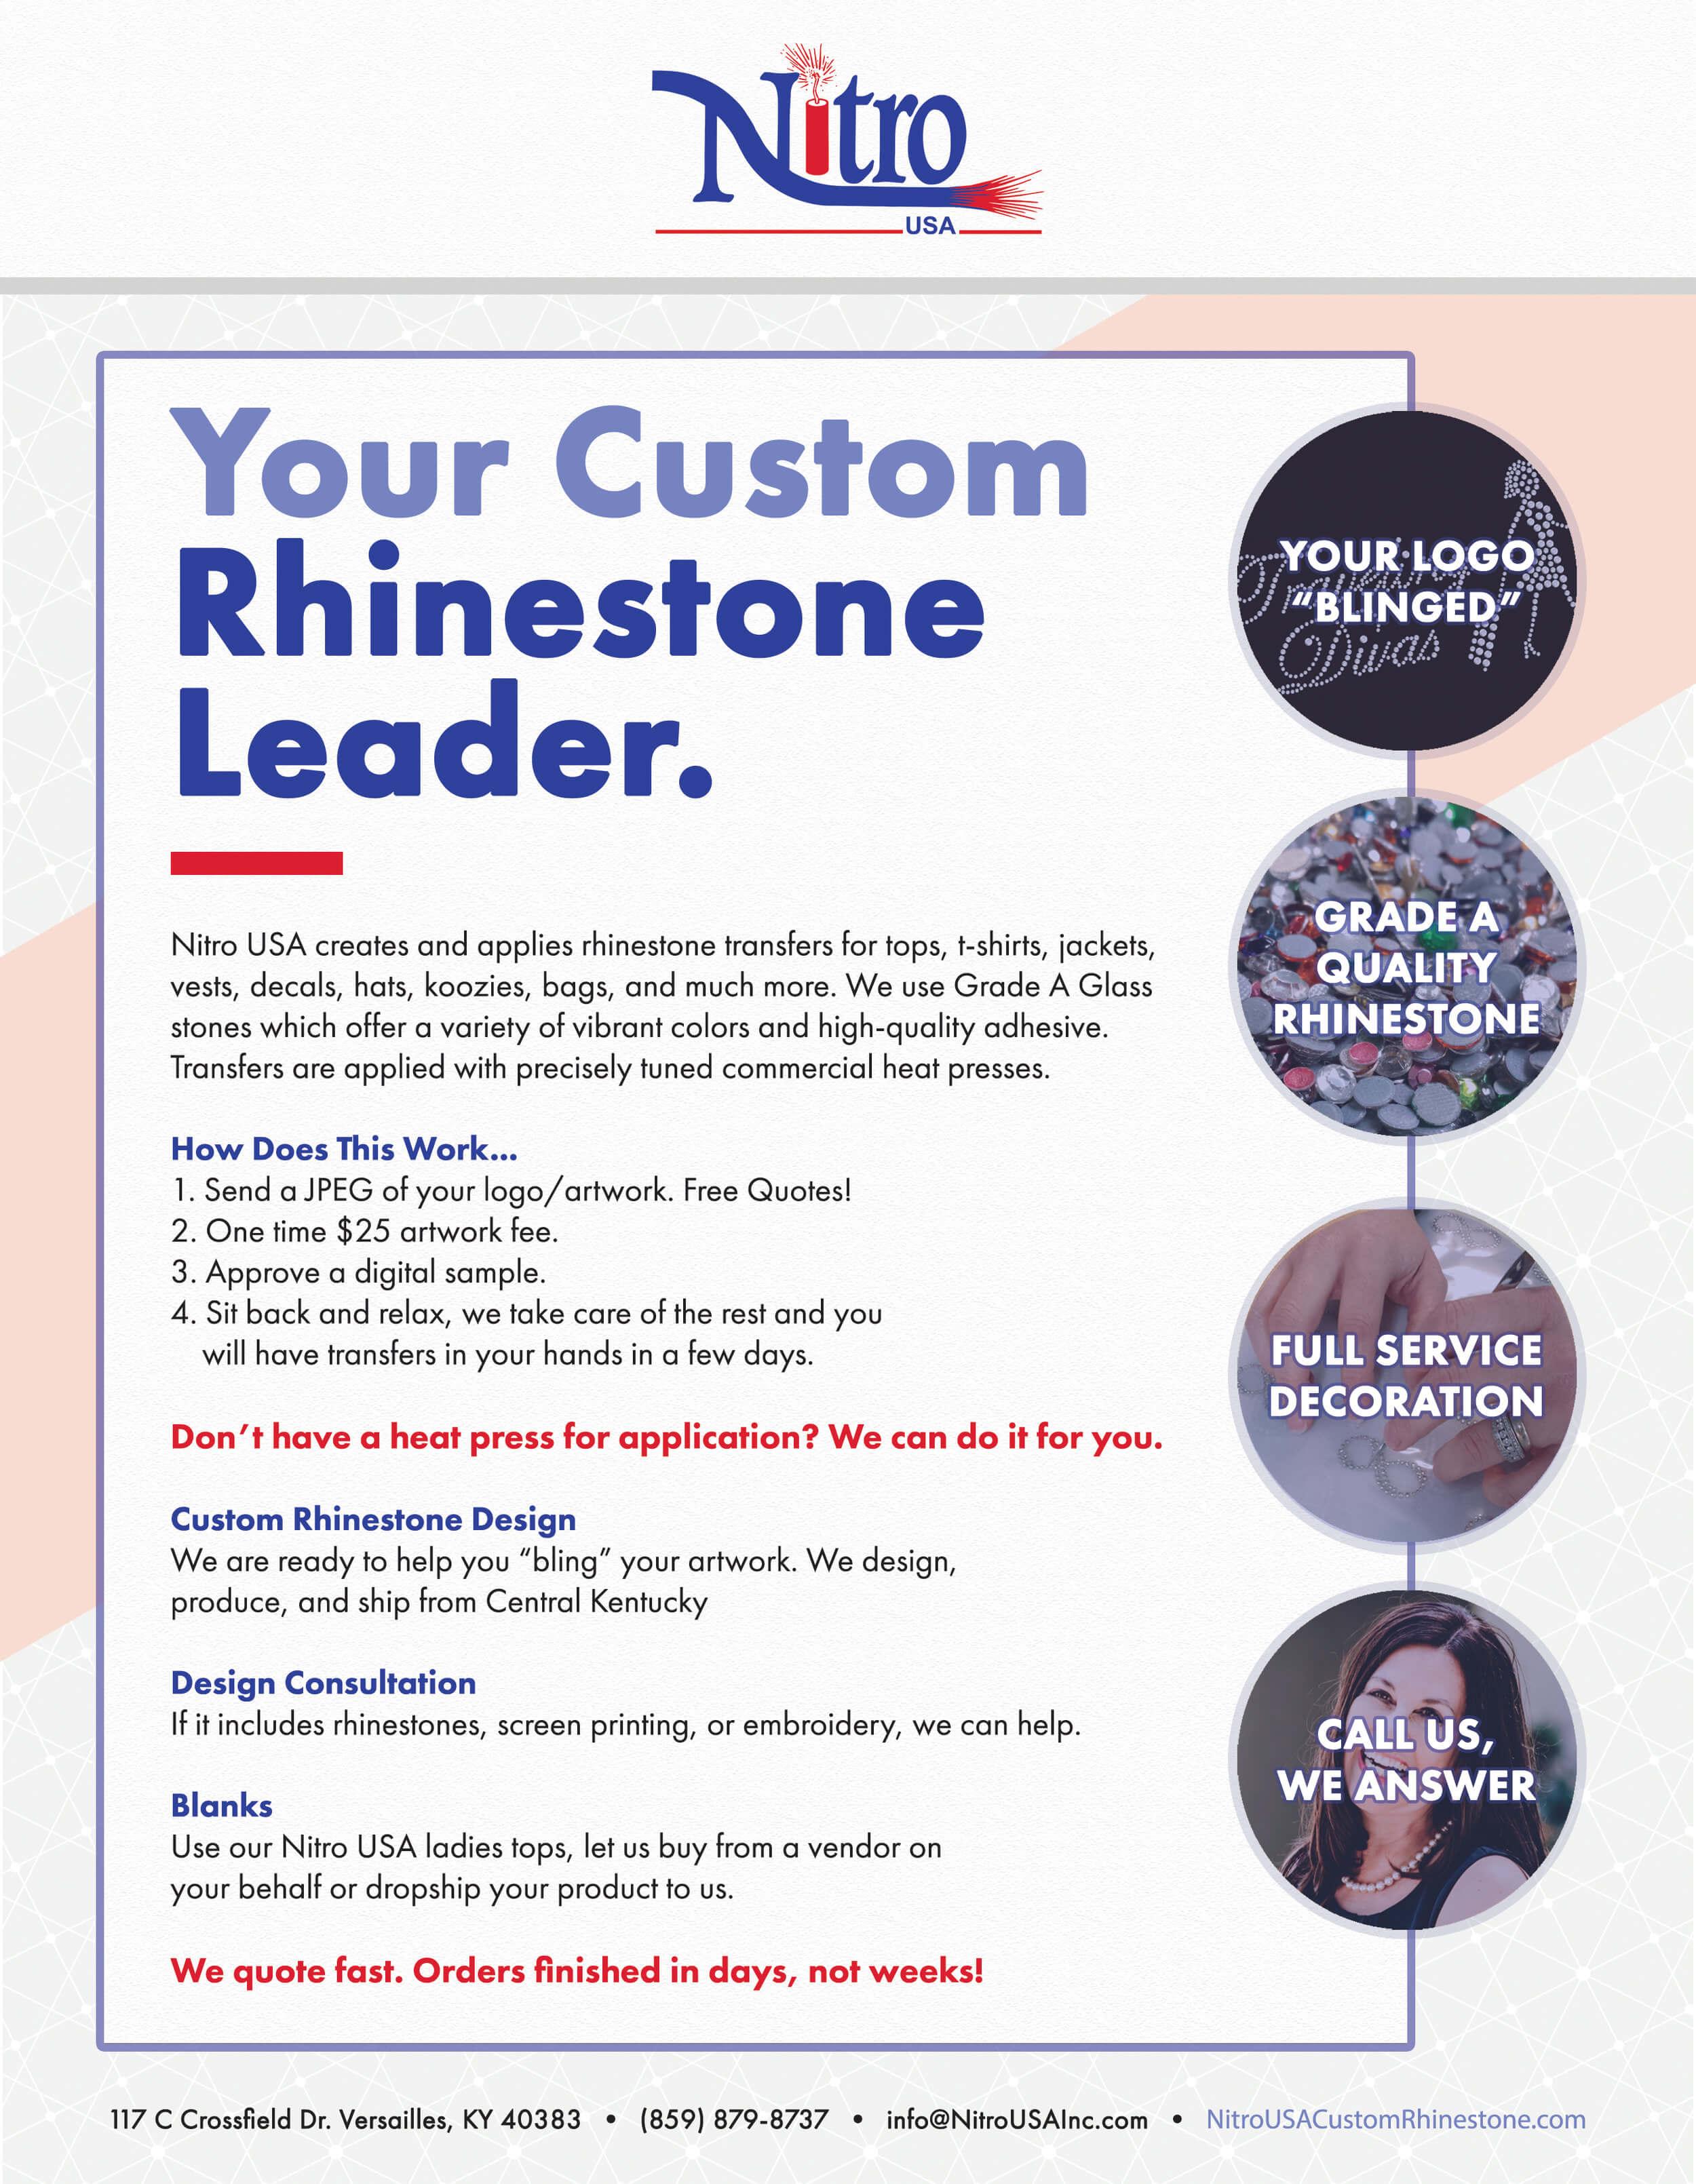 nitro-usa-inc-custom-rhinestone-leader.jpeg